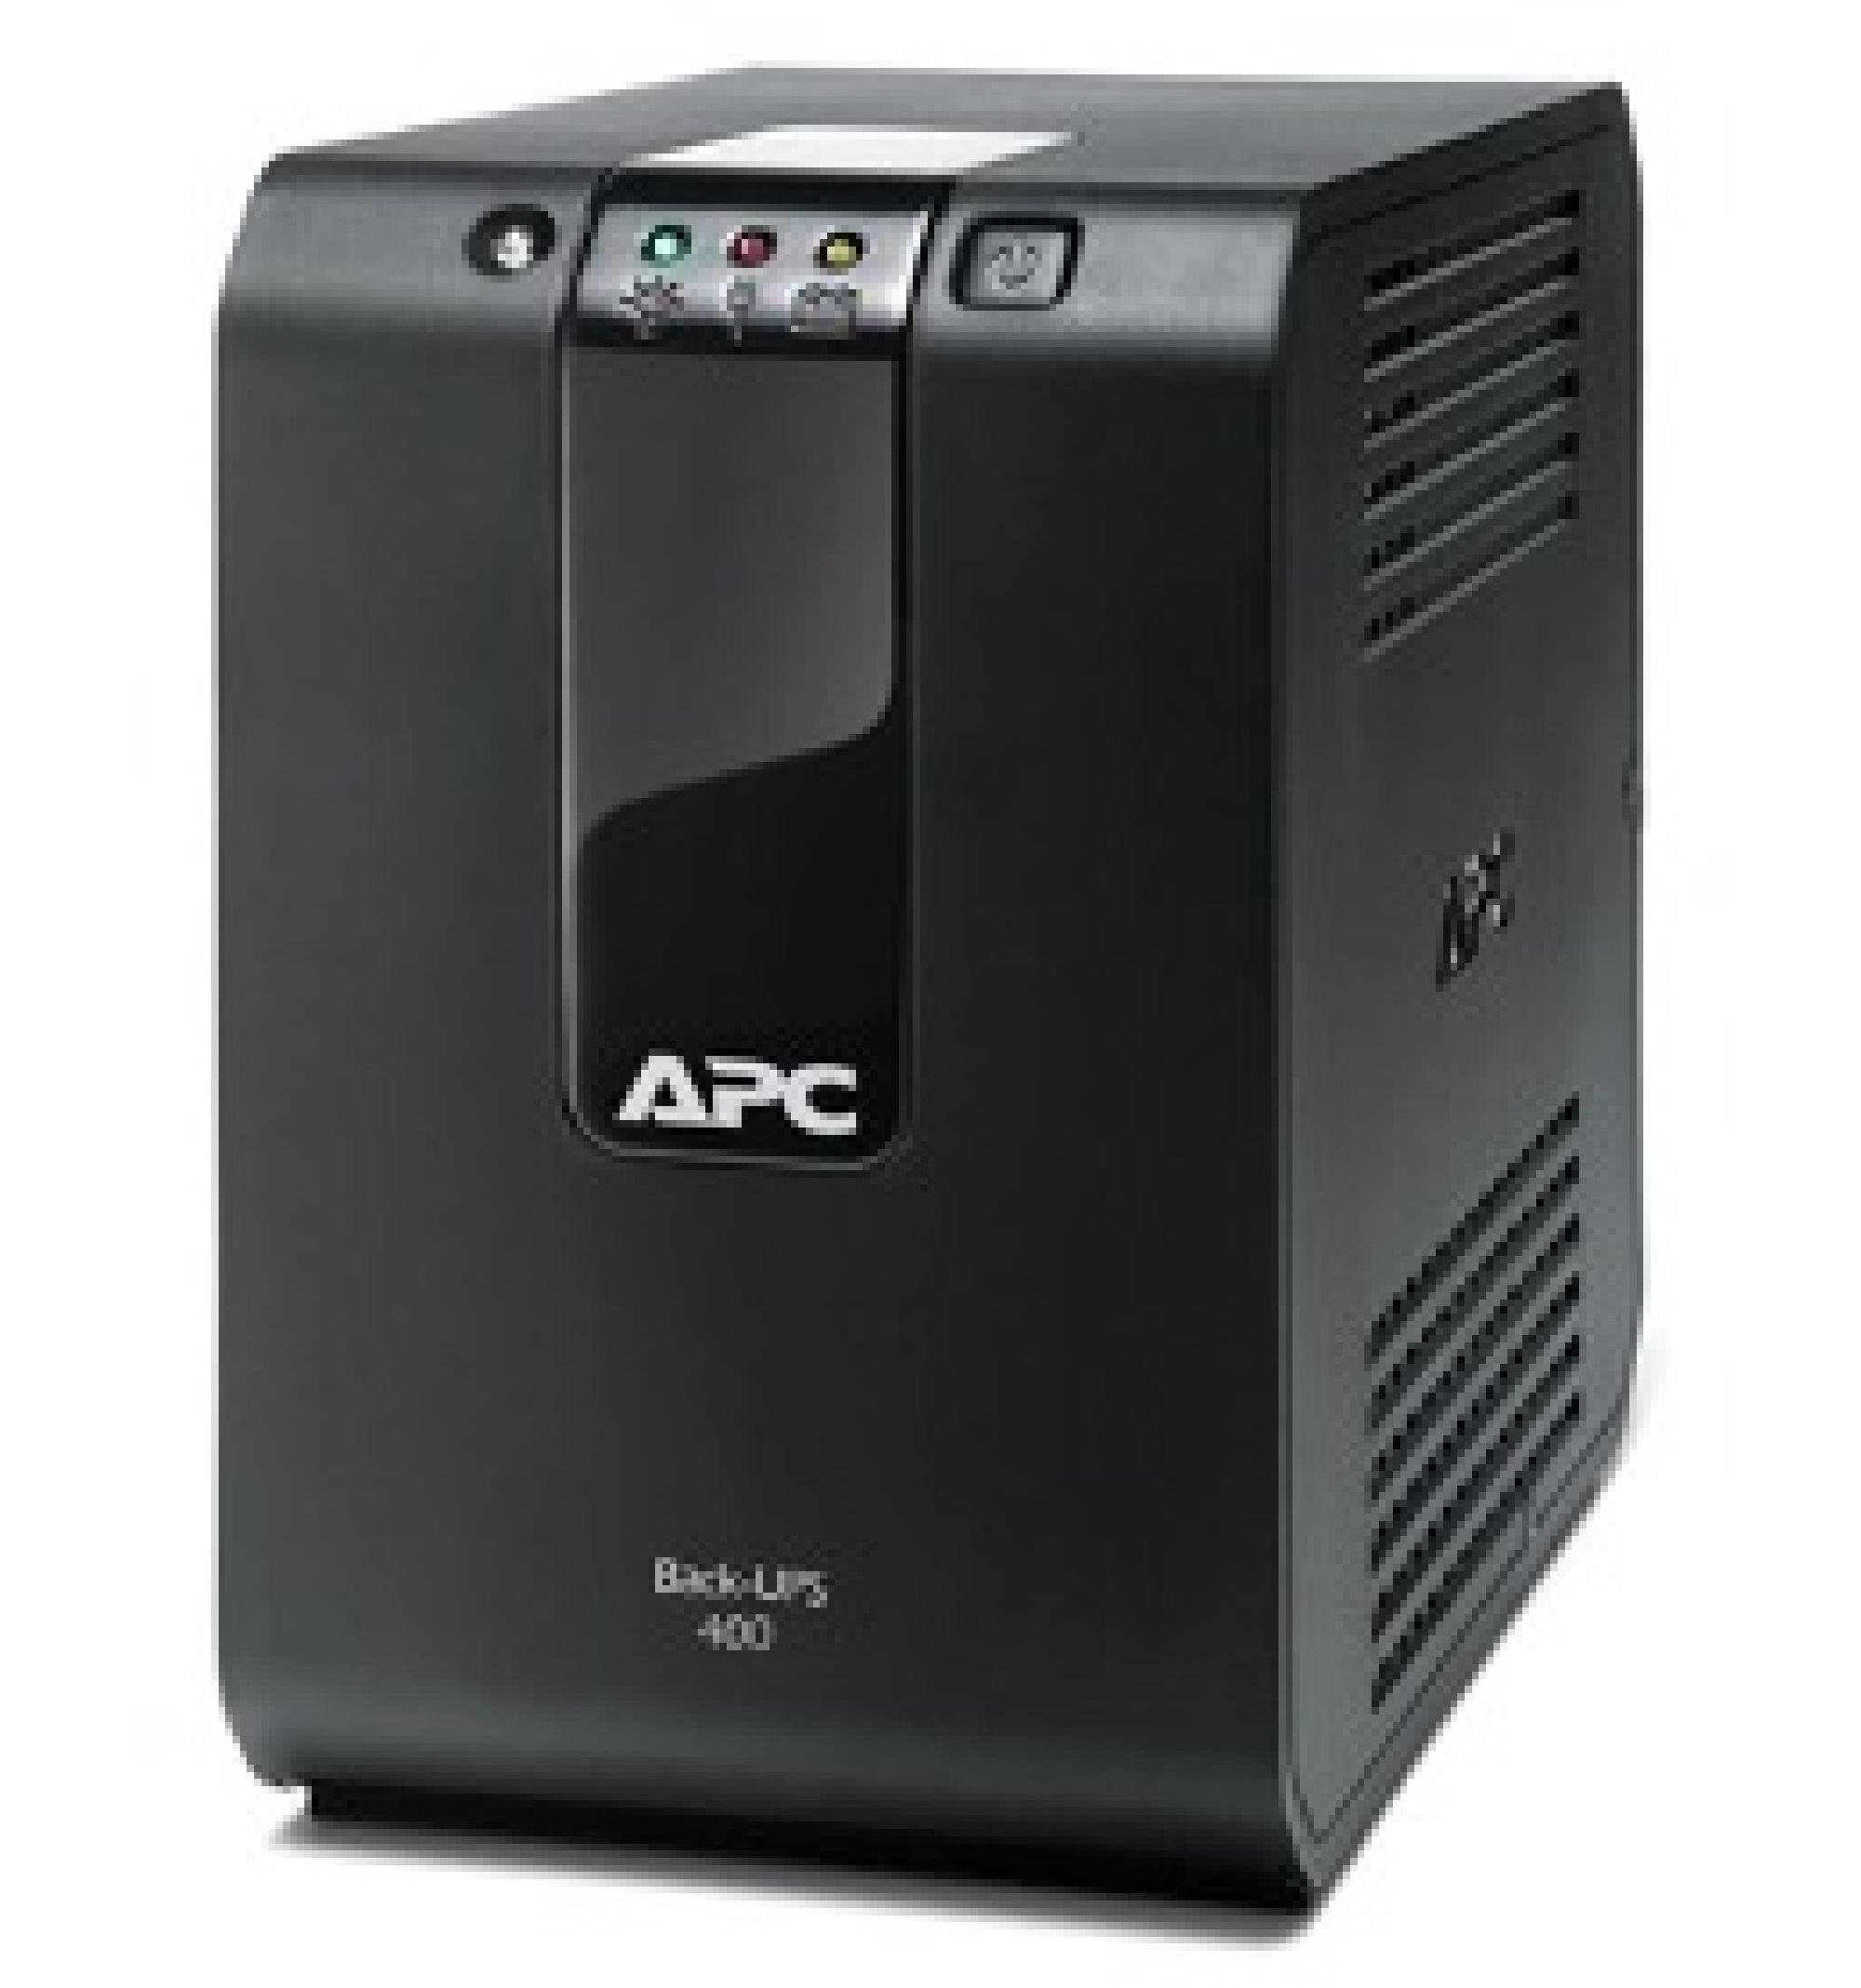 Back-UPS da APC de 400 VA e 115 V